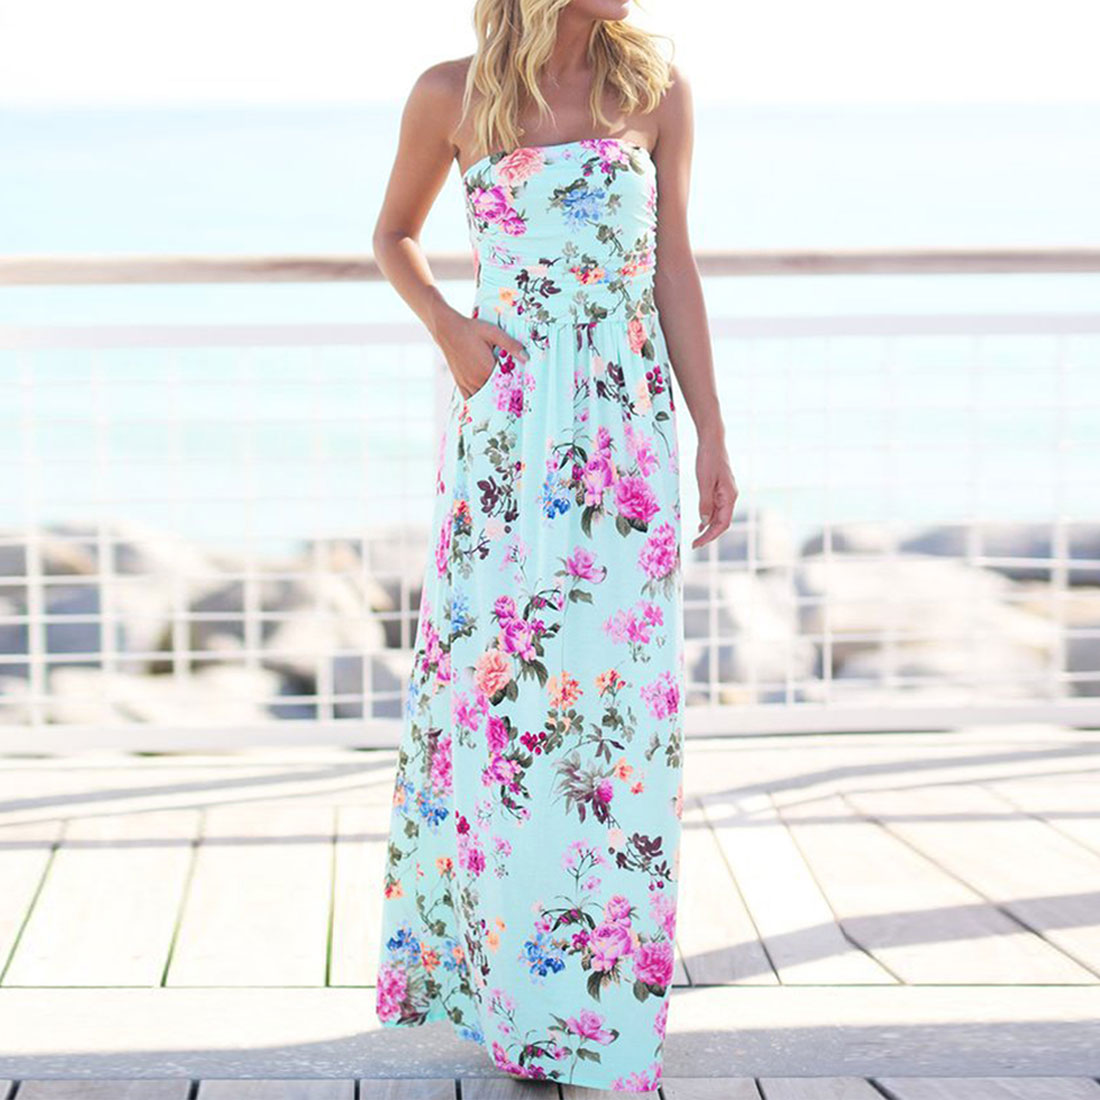 Charming Women Fashion Summer Beach Bohemian Boho Long Dress Strapless Shoulder Off Floral Printed Maxi Dress